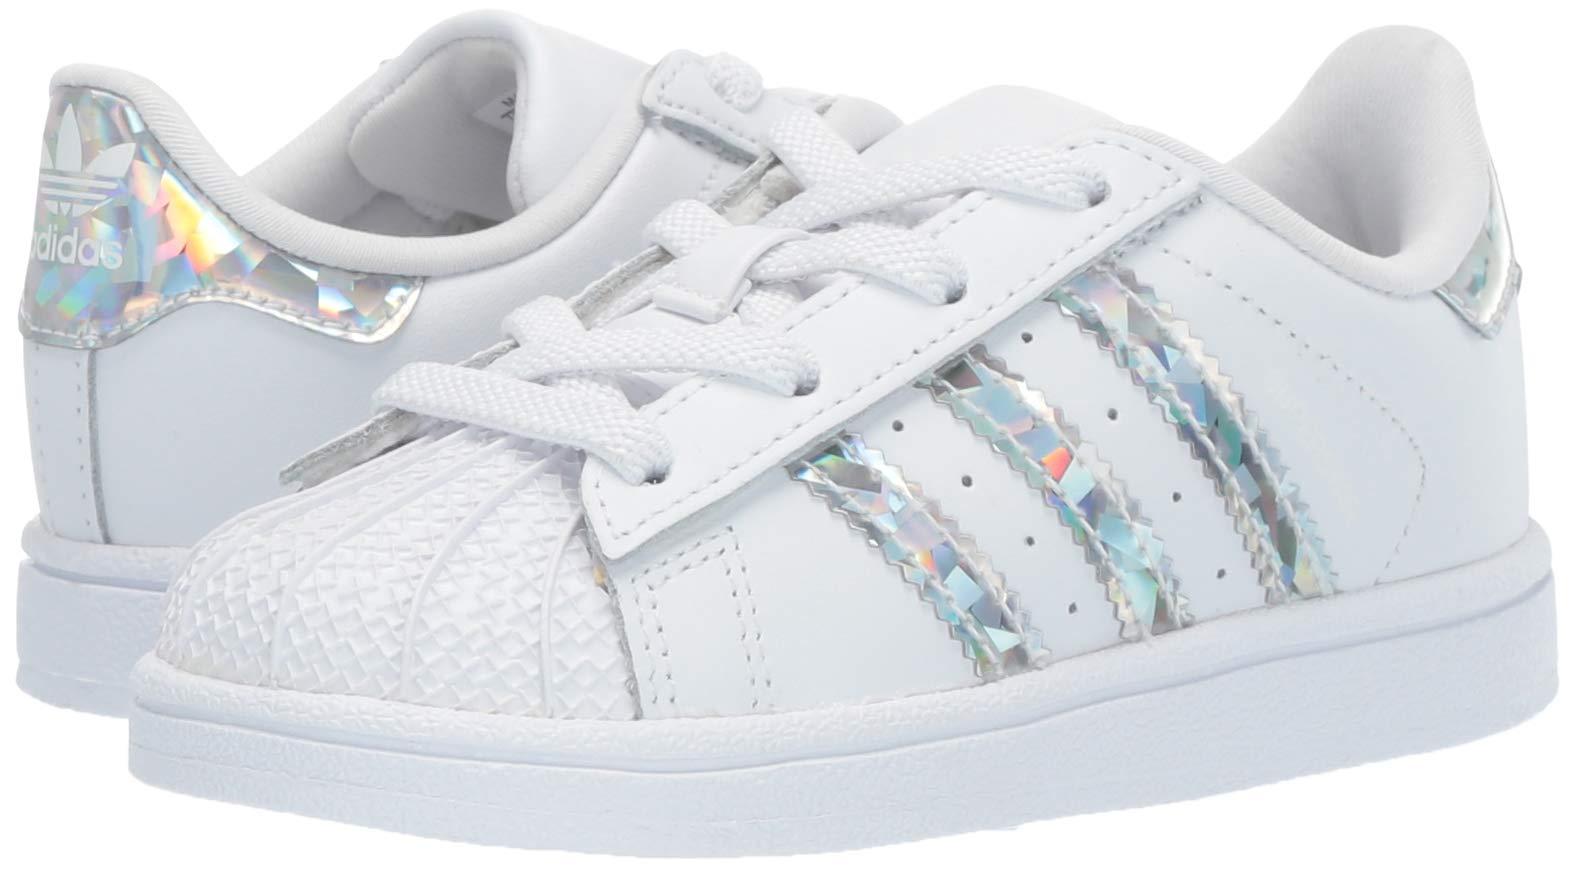 adidas Originals Unisex Superstar Running Shoe, White/White/White, 1 M US Little Kid by adidas Originals (Image #6)